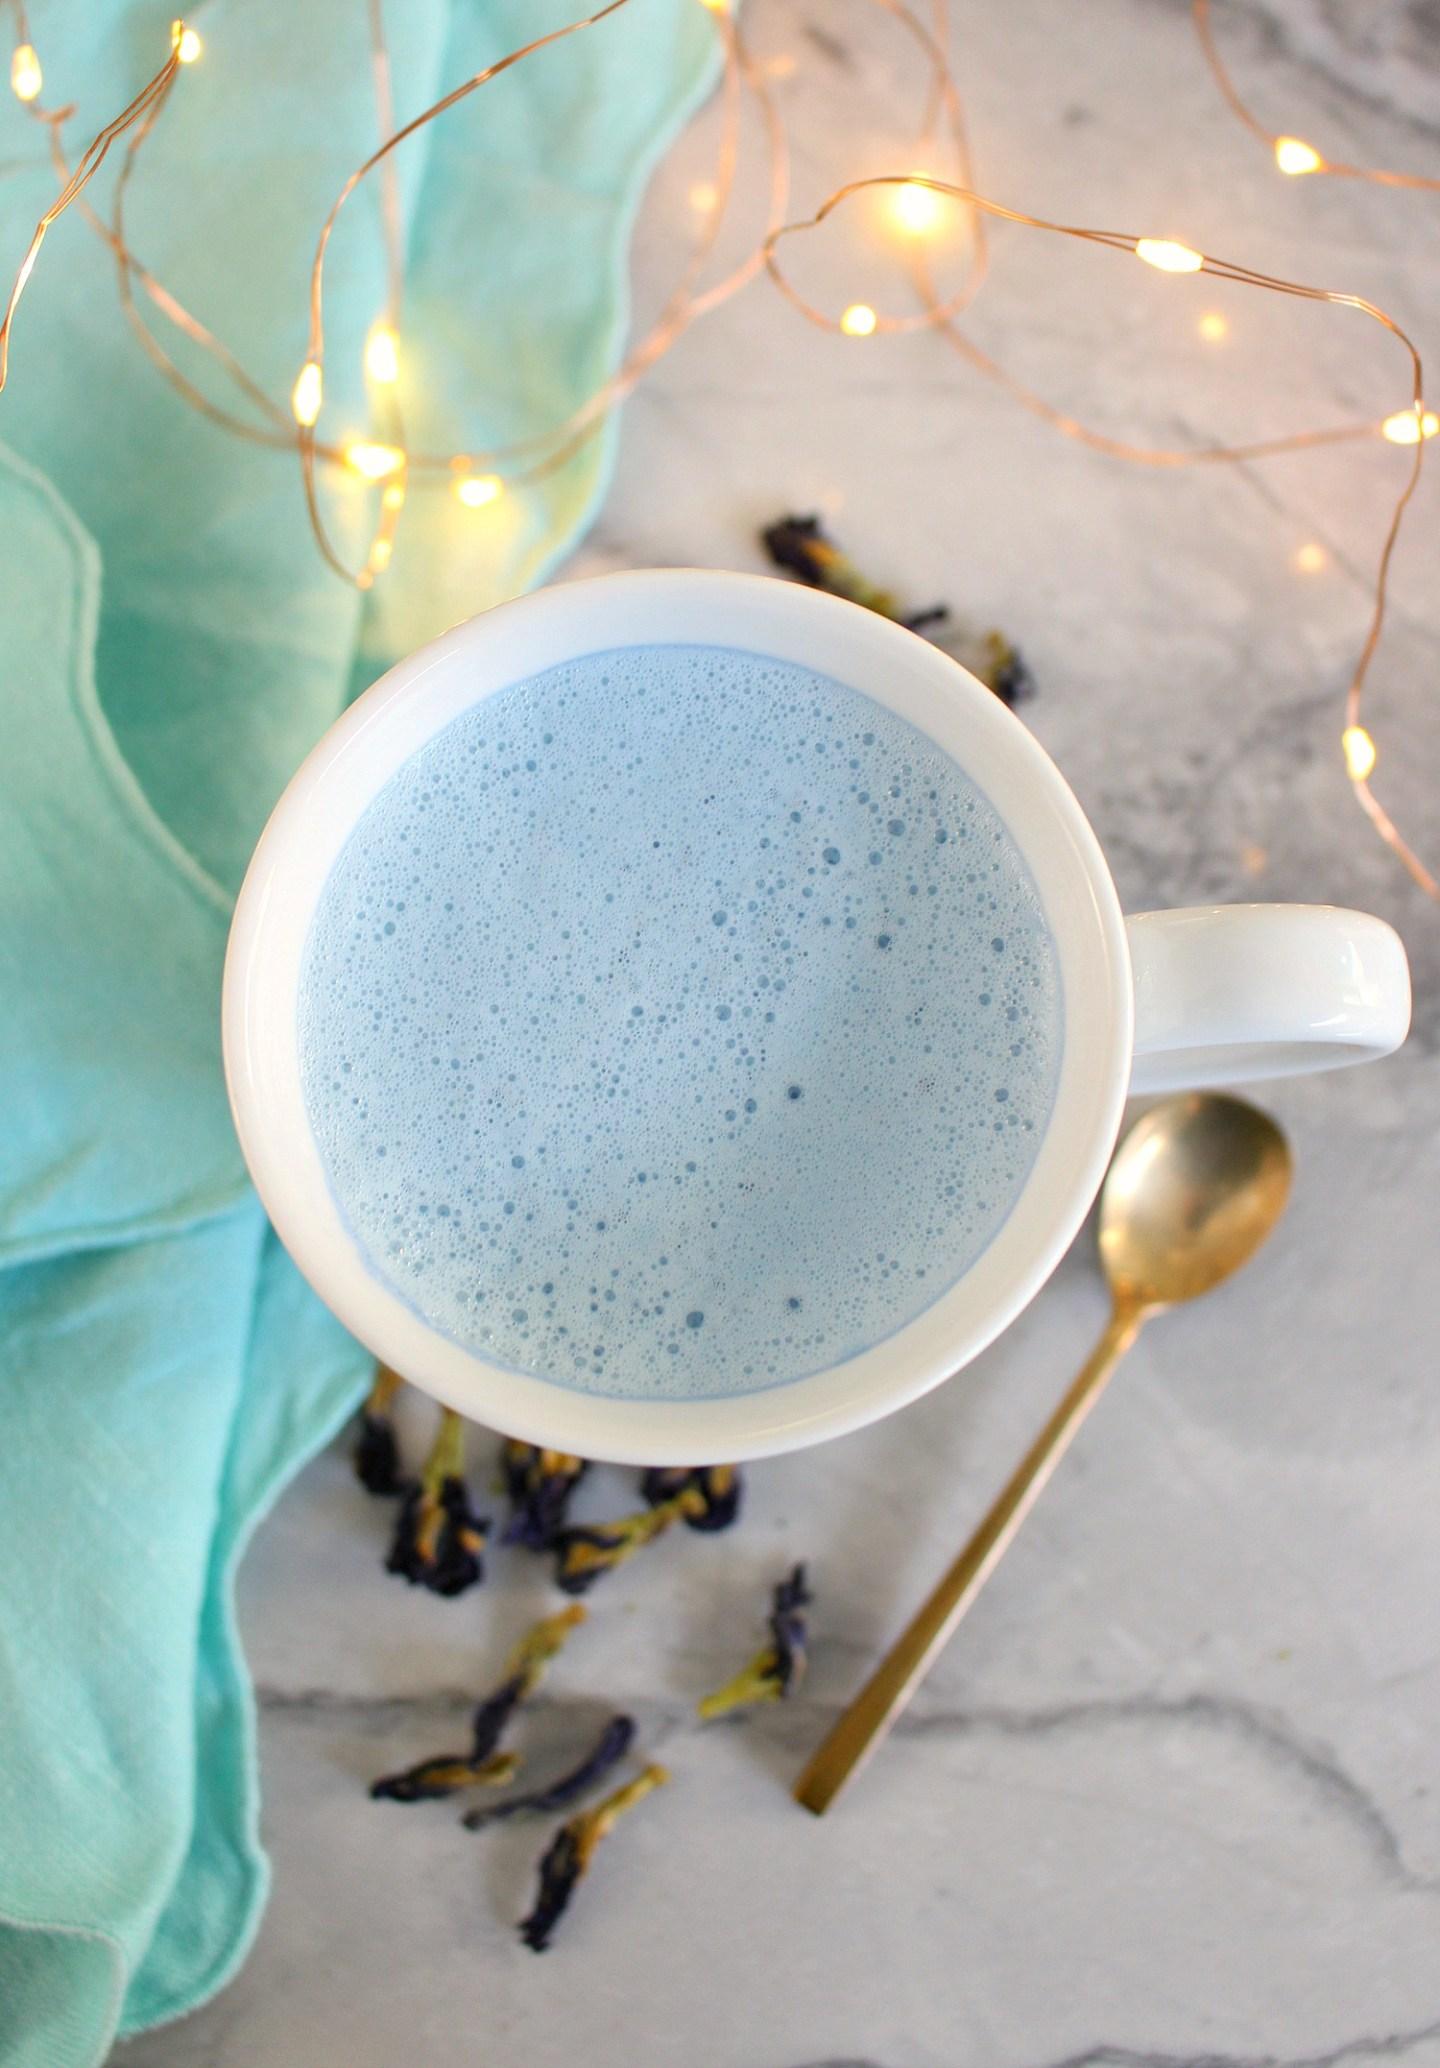 What is Moon Milk?